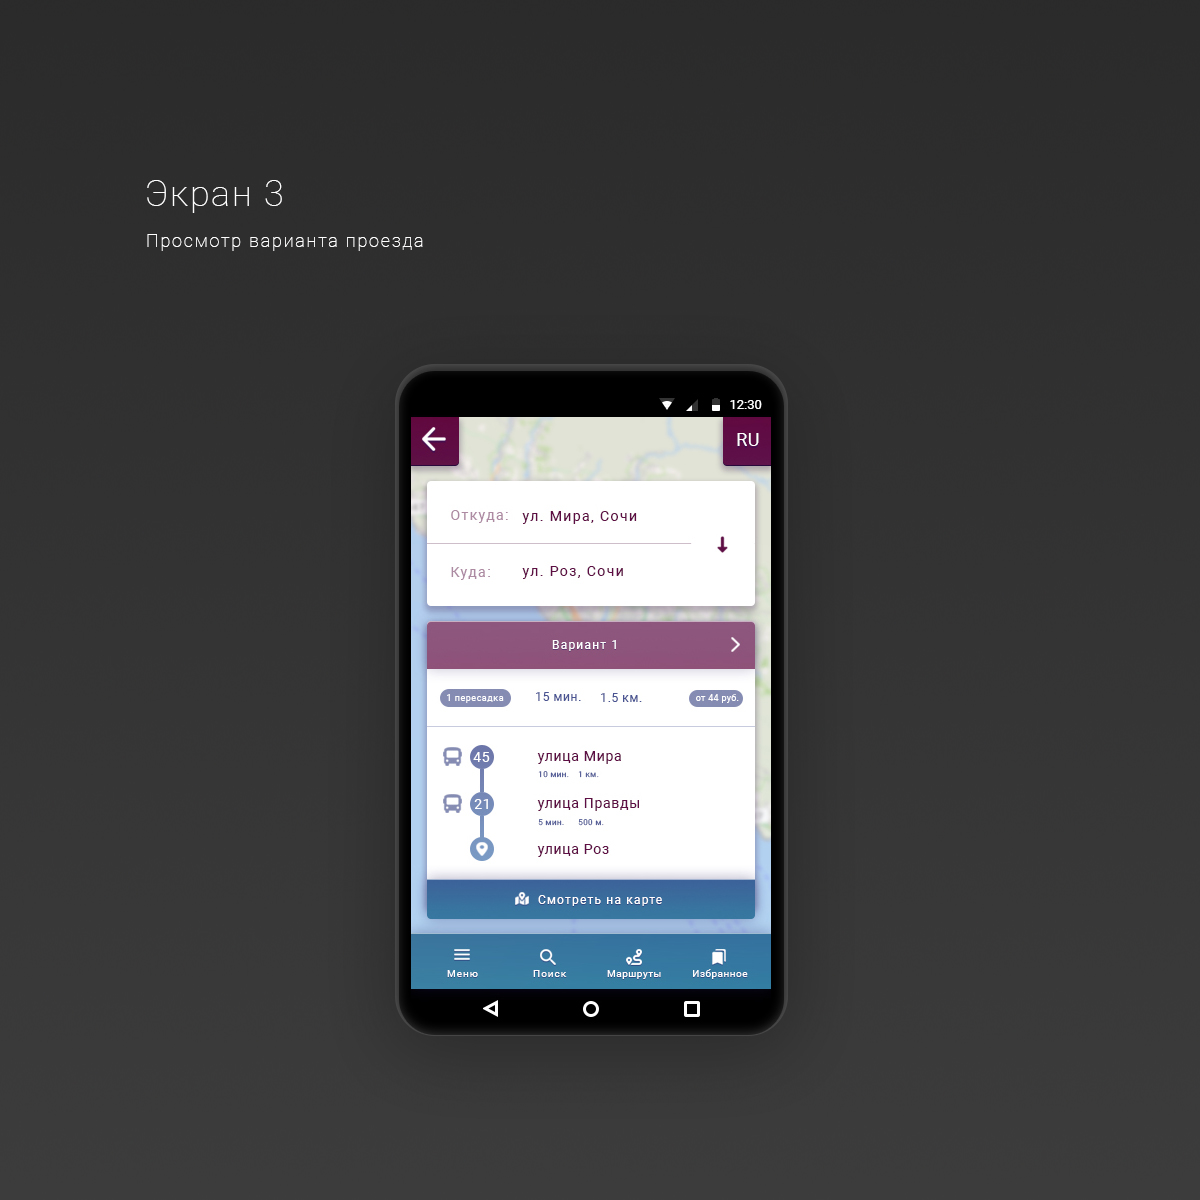 Дизайн-концепция мобильного приложения (3 экрана) фото f_6425b7da10fd3944.jpg